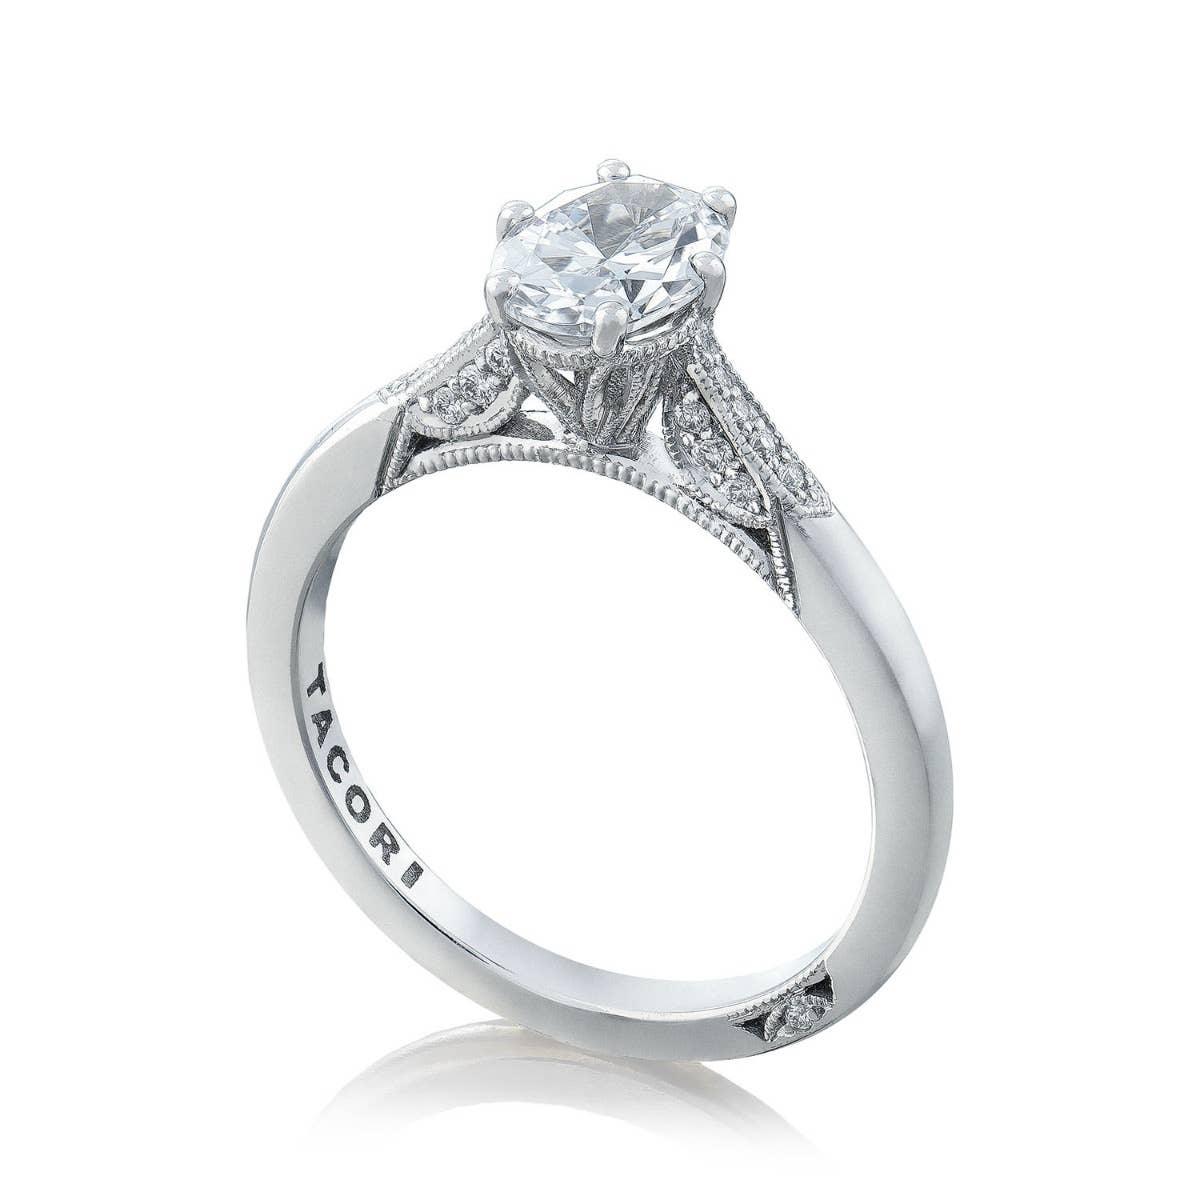 Tacori Engagement Rings - 2651ov